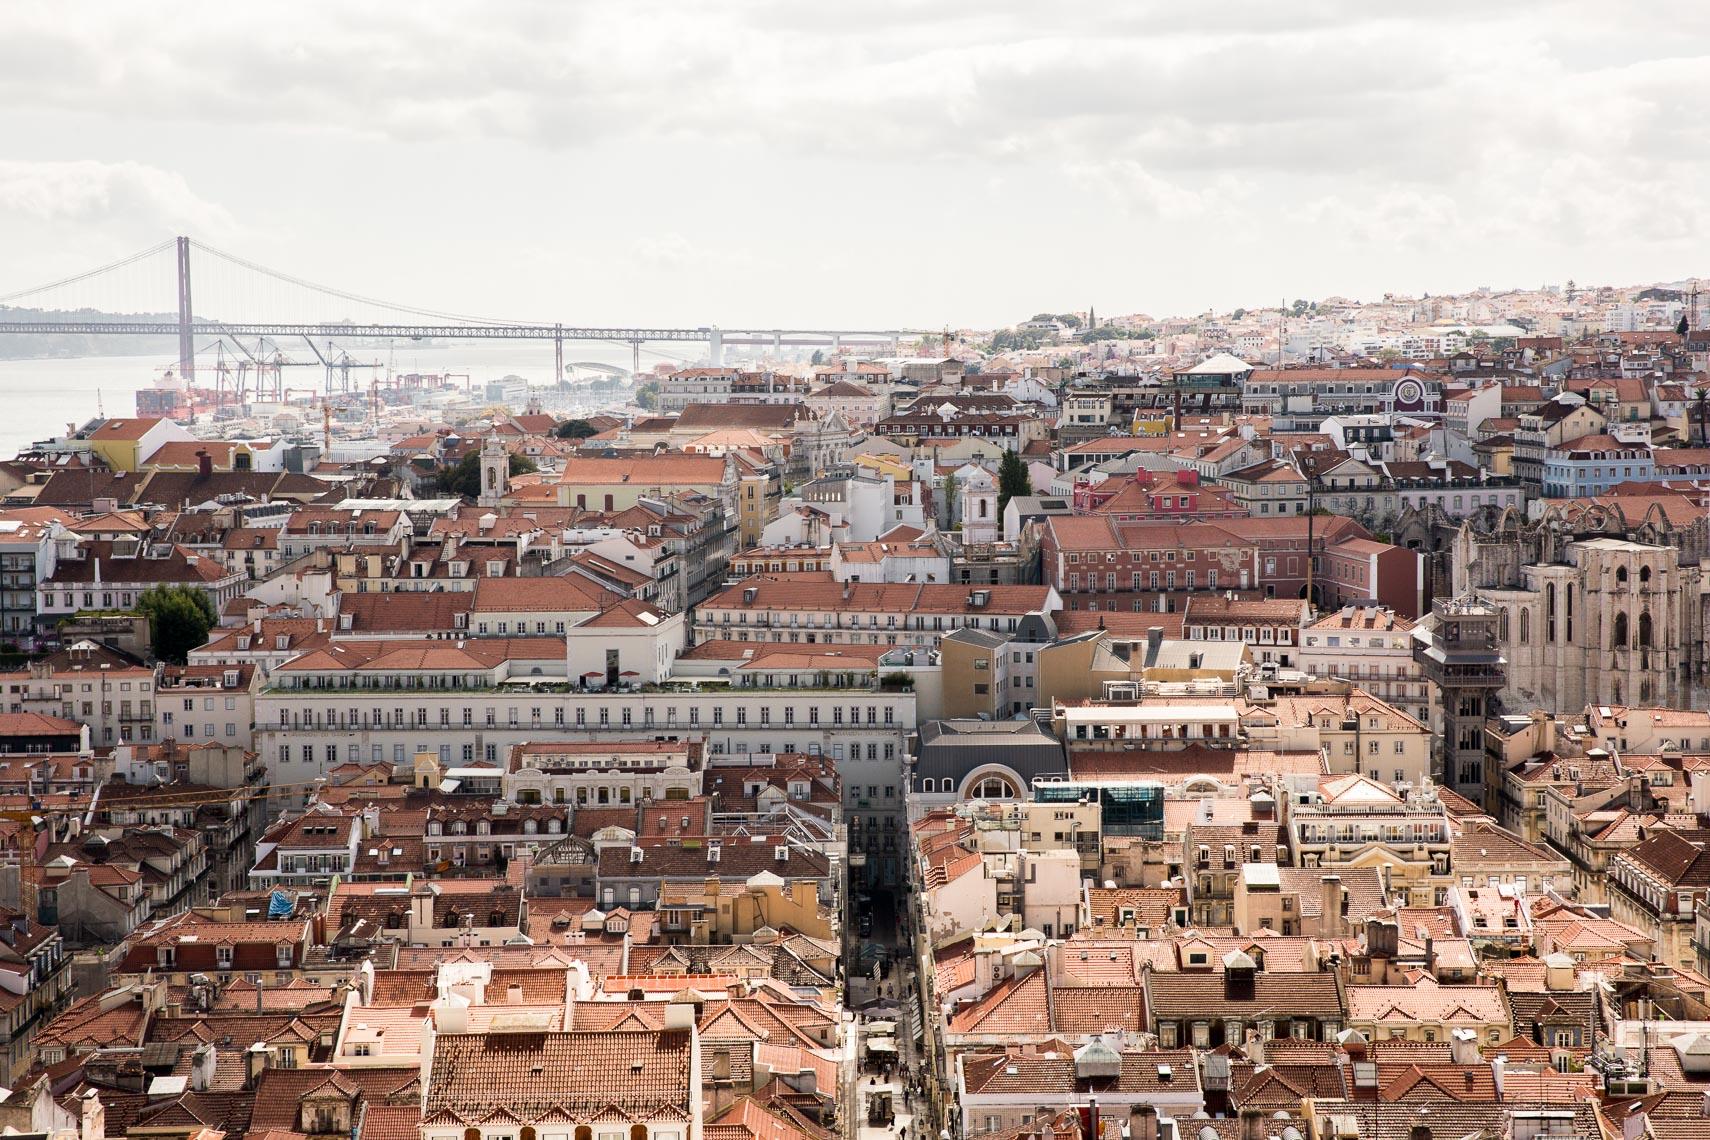 MR_150623_Portugal_0409.jpg